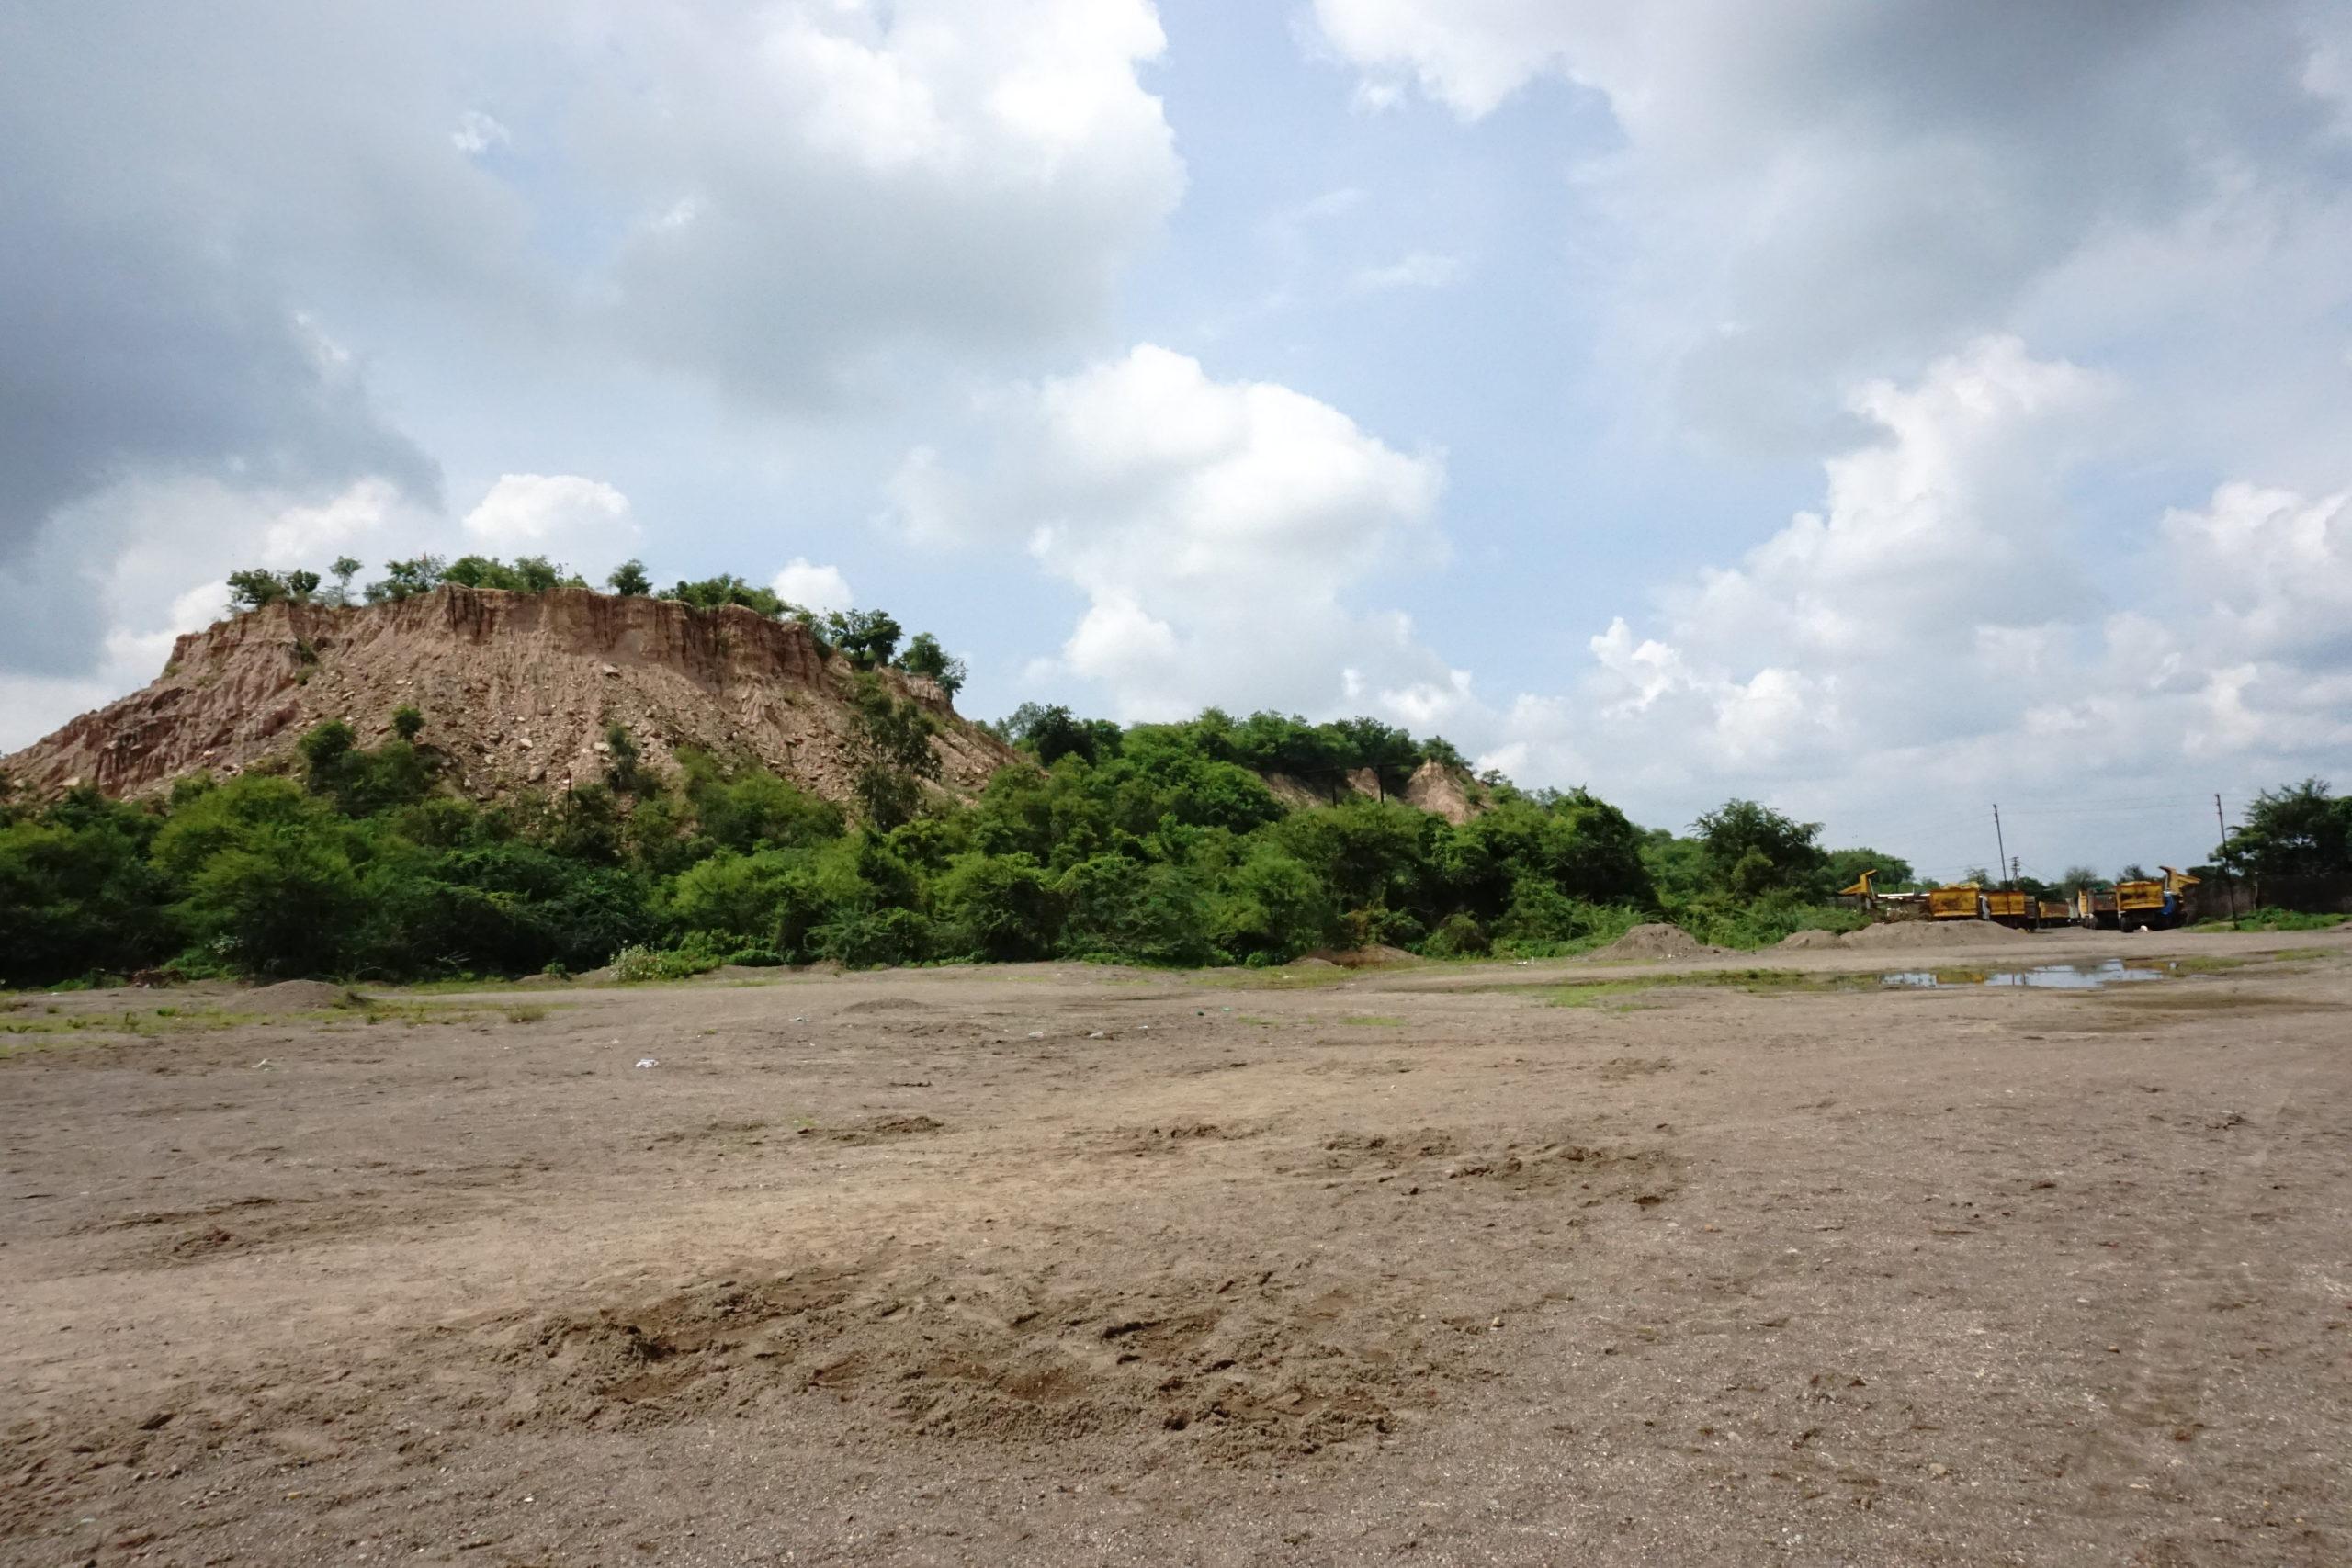 Overburden block or waste from mining has vegetation of Prosopis species providing smooth wildlife corridor between the TATR and CSTPS. Photo by Saurabh Katkurwar